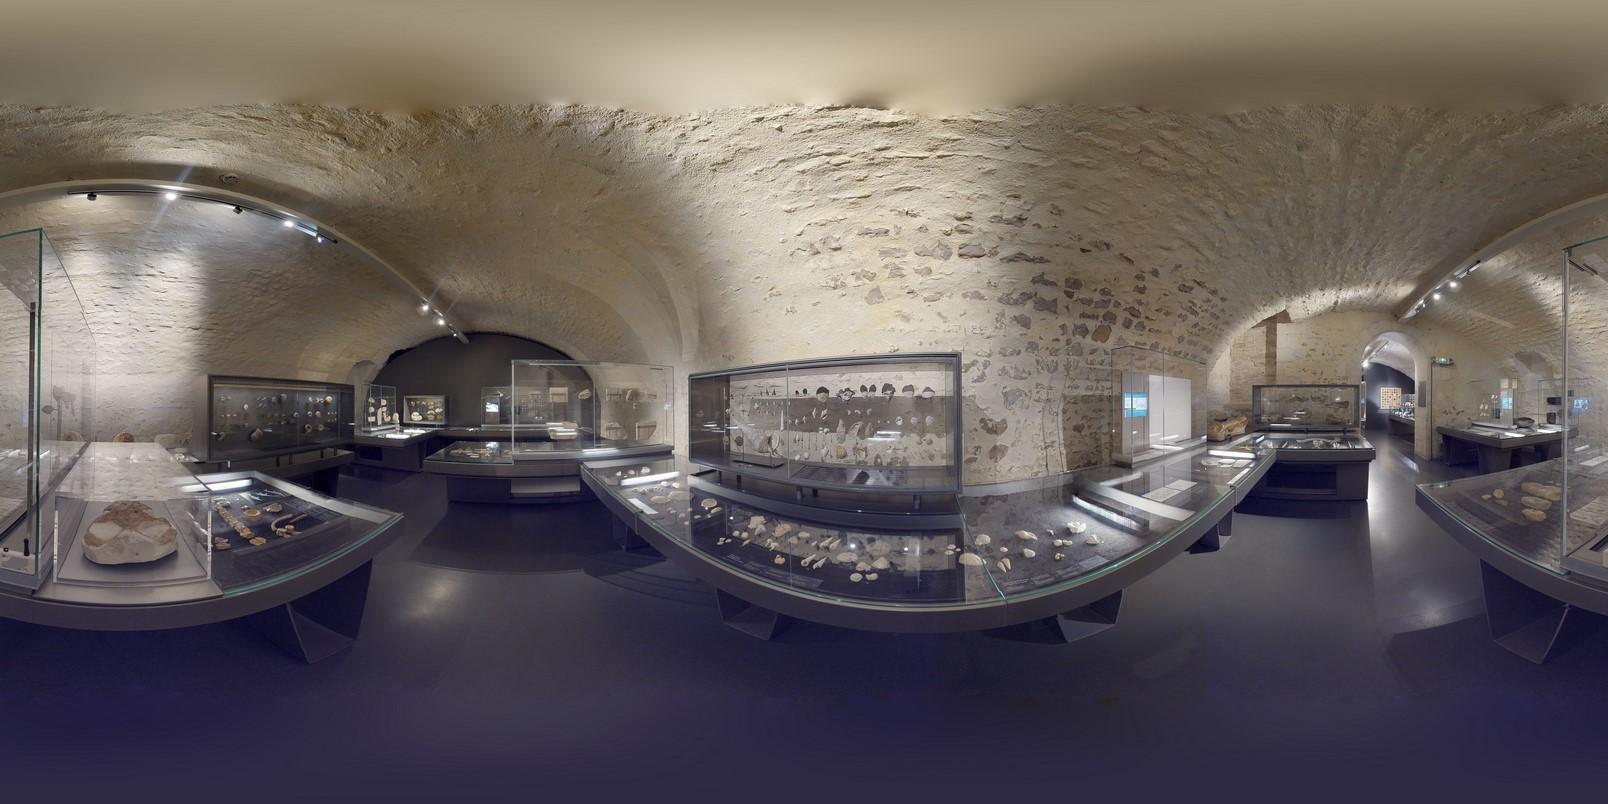 Muséum histoire naturelle La Rochelle Fossiles